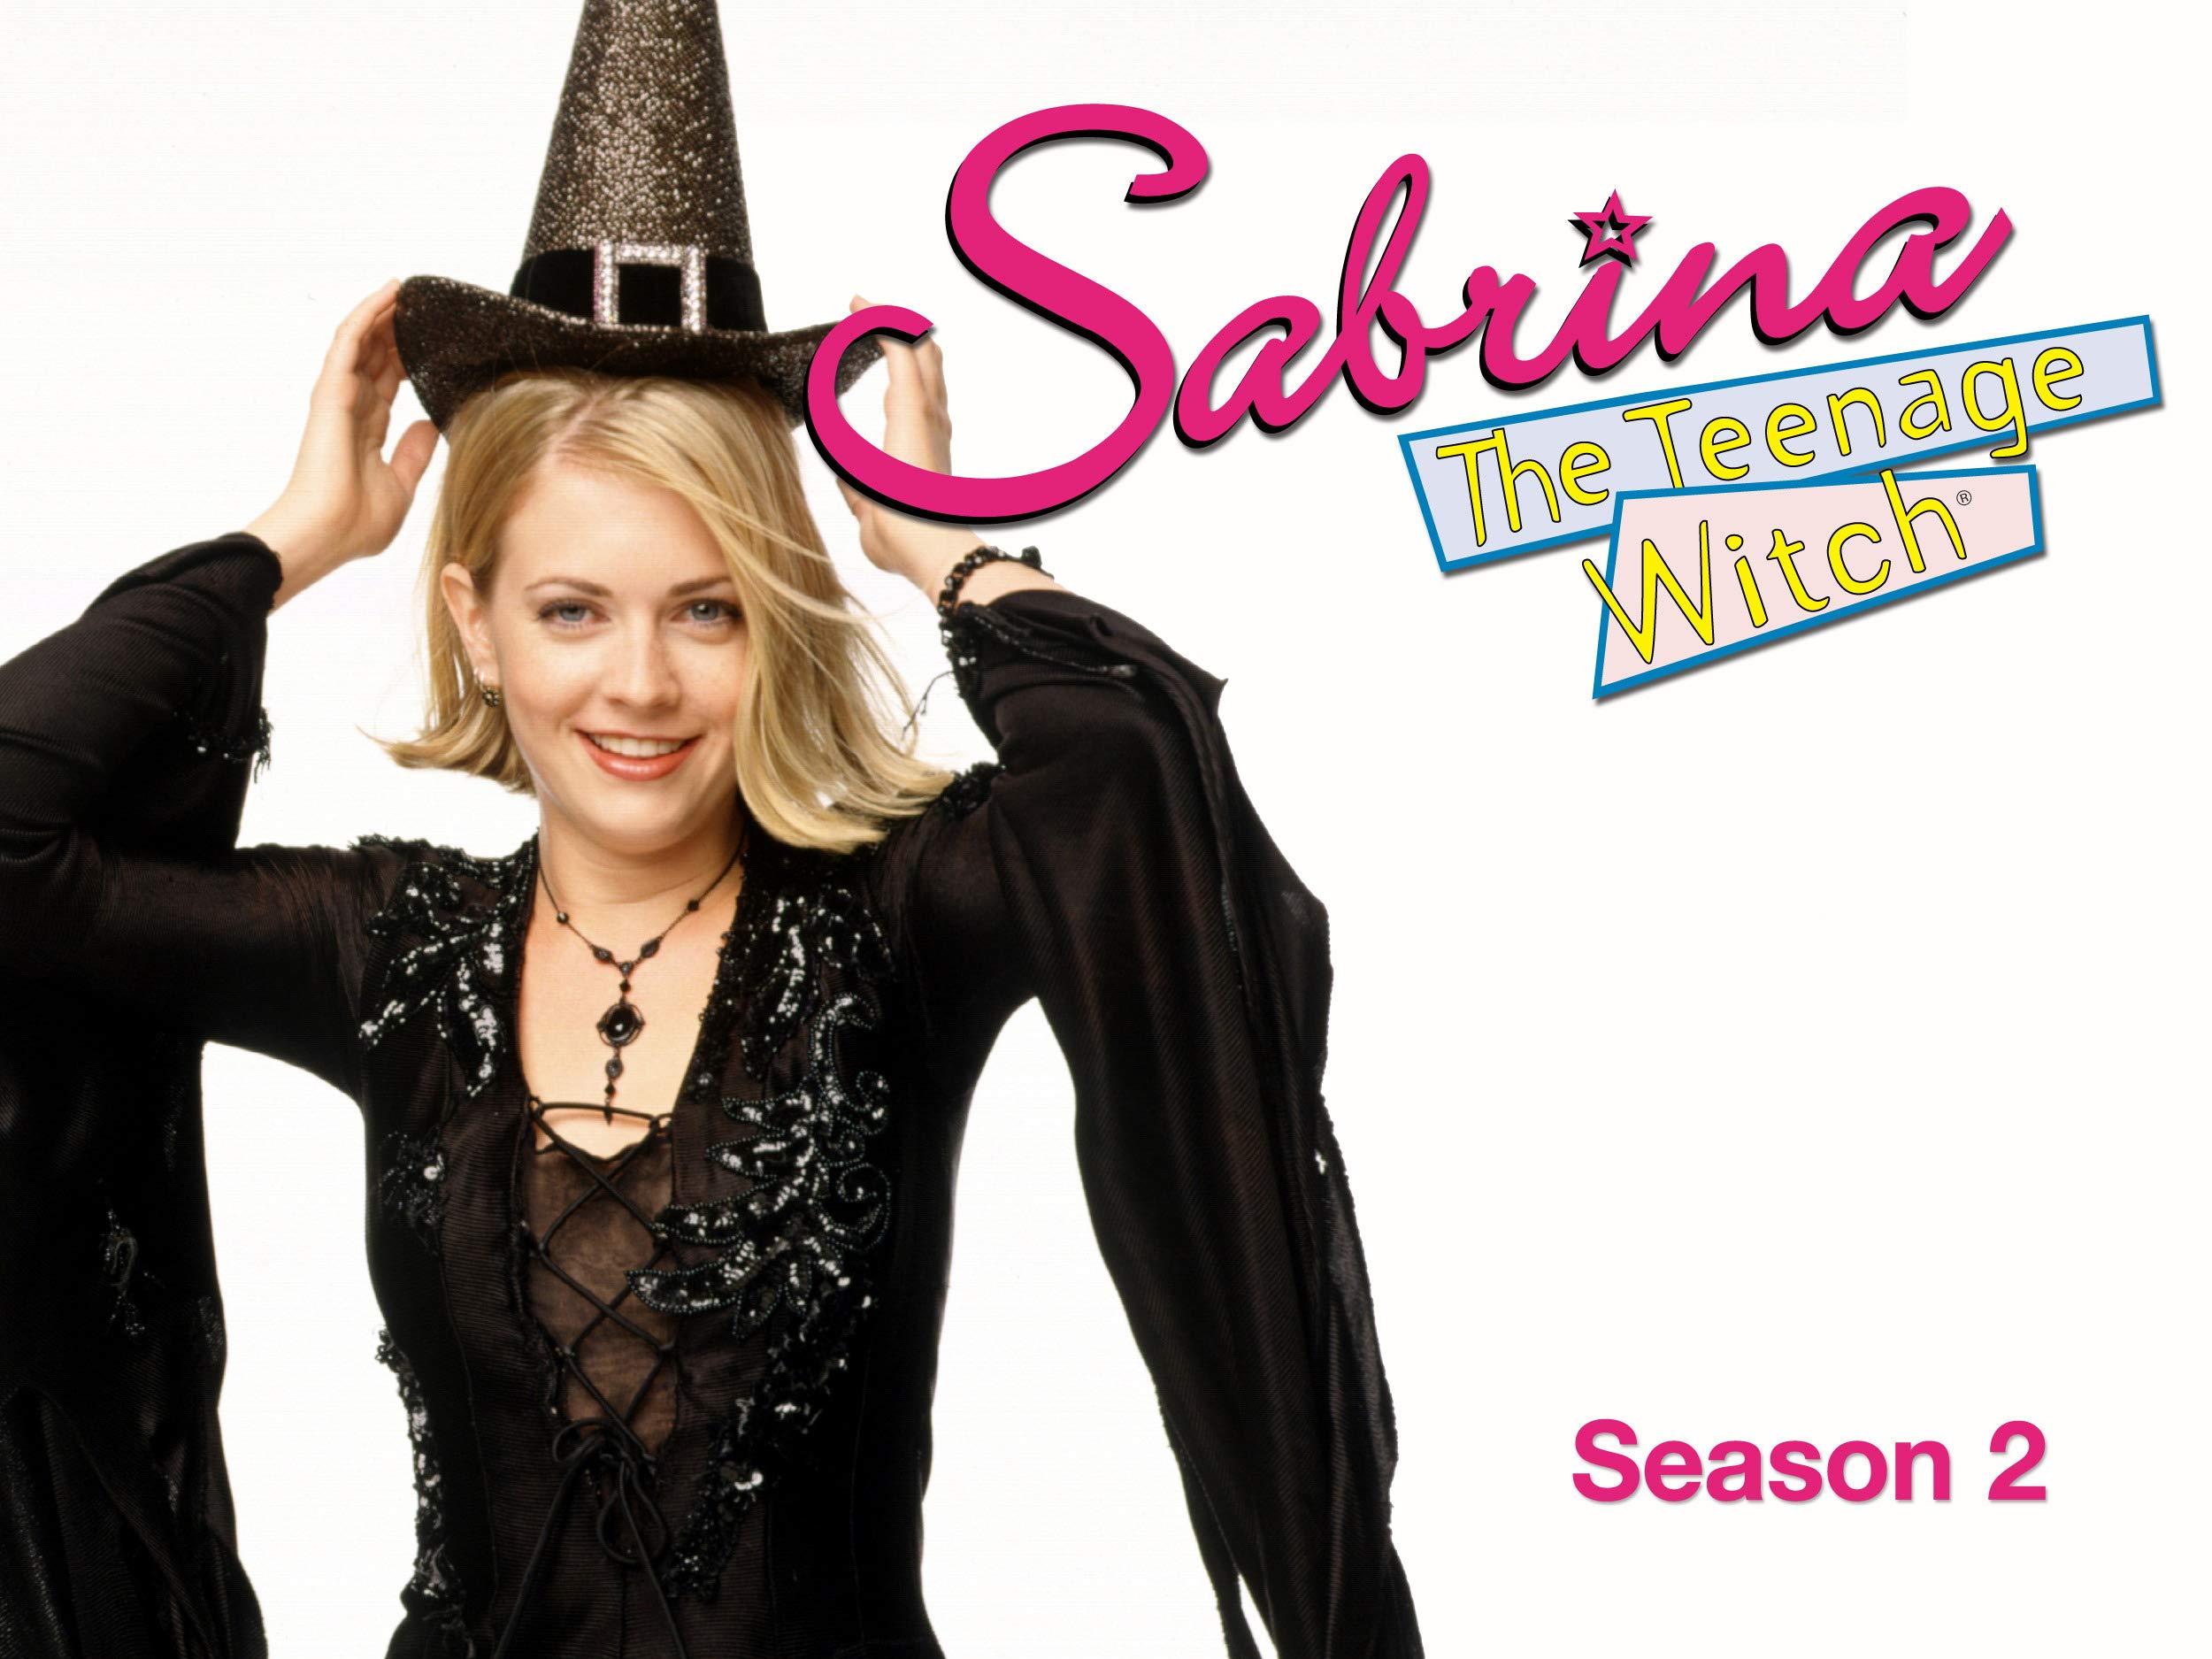 Sabrina: The Teenage Witch - Season 2